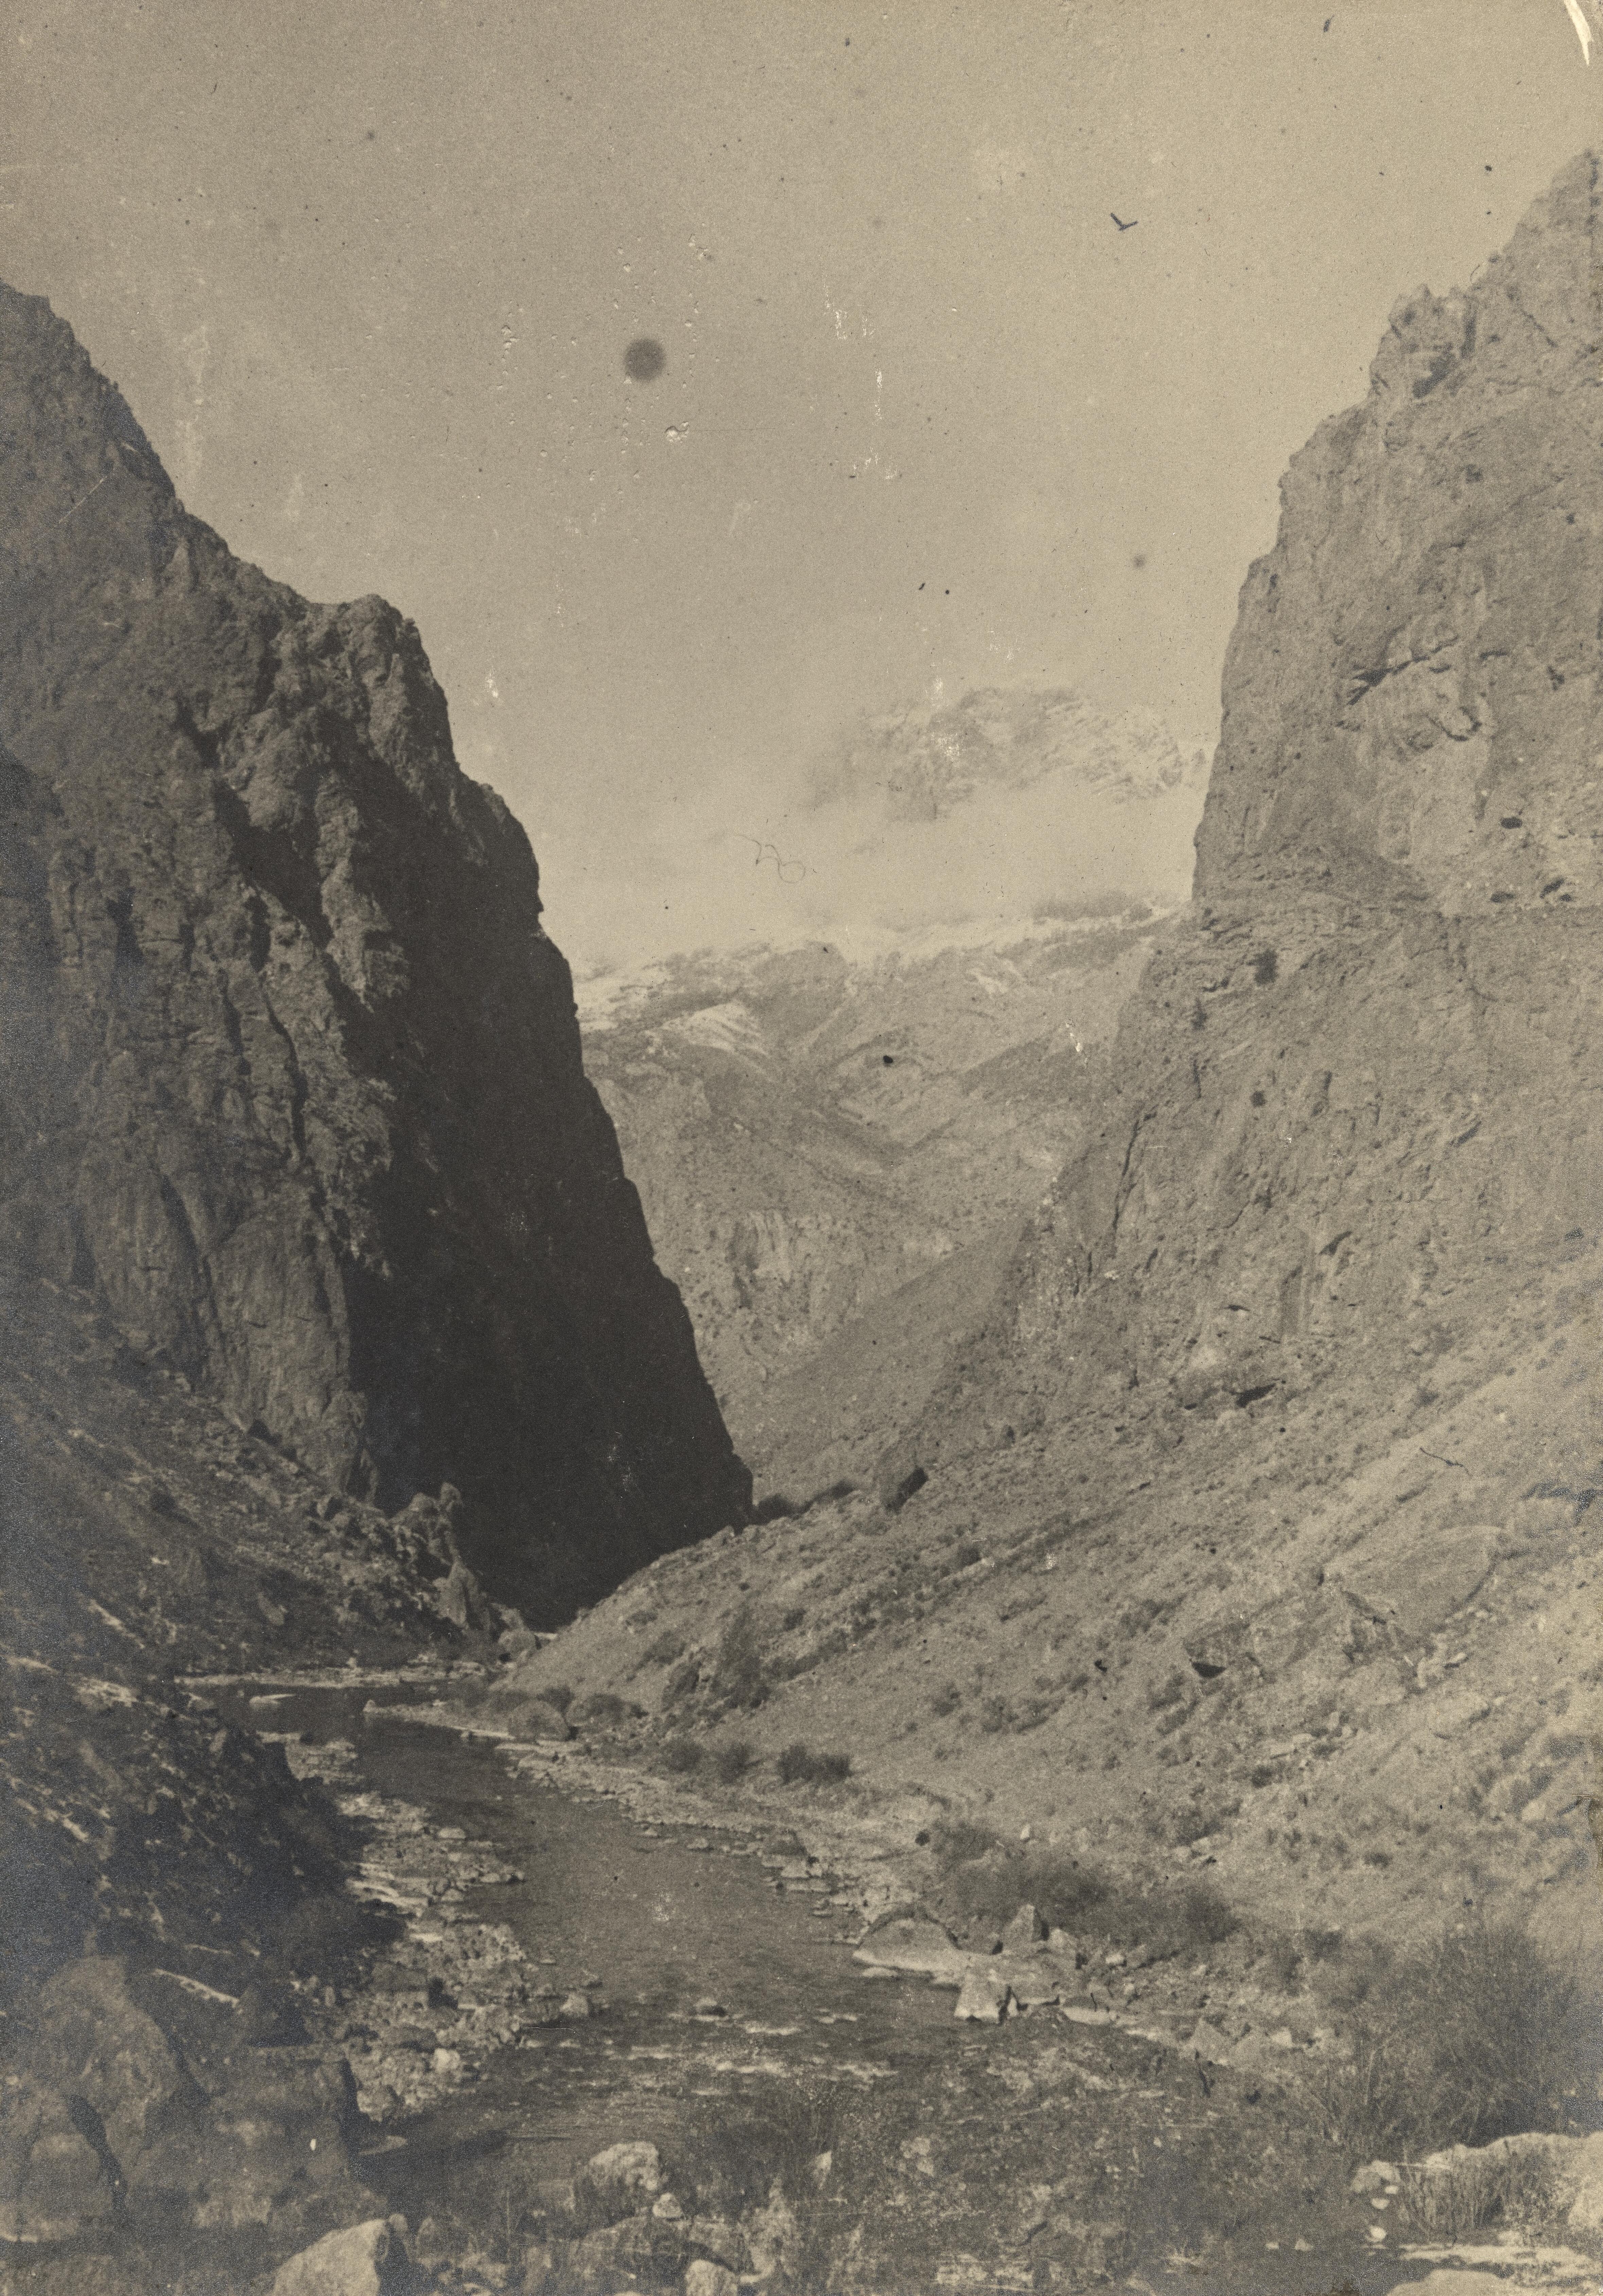 17. Река Ягнобдарья